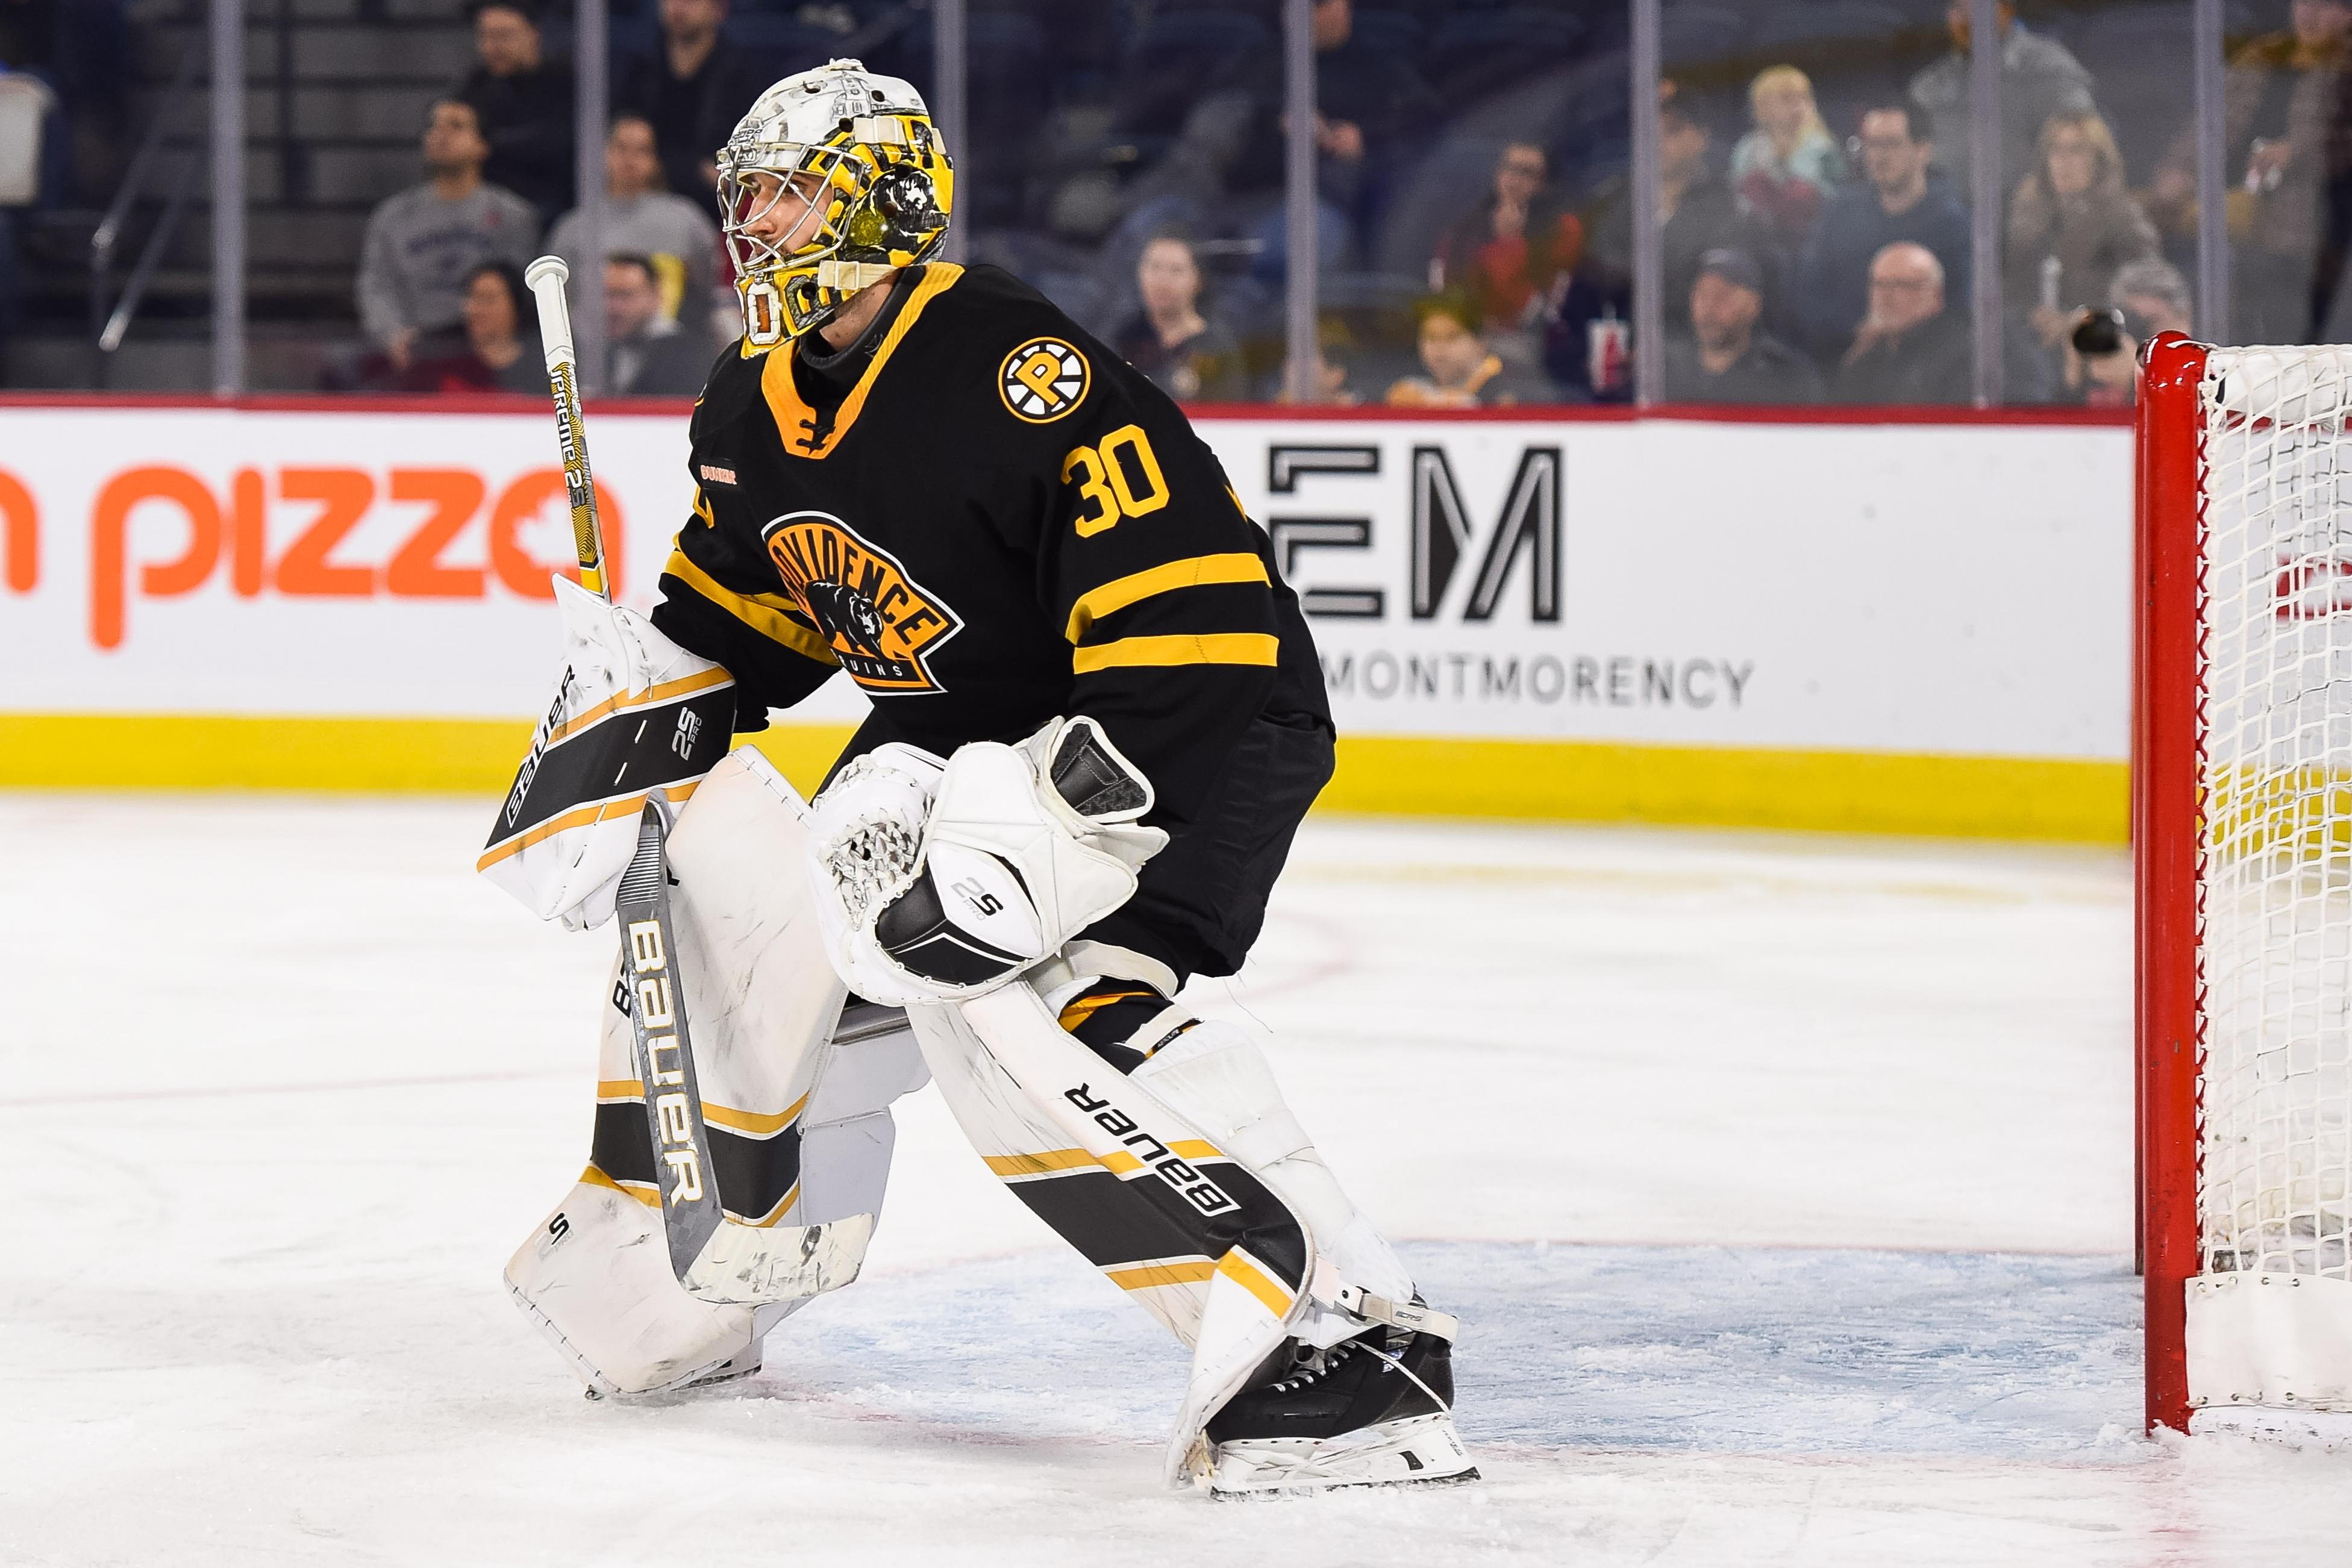 AHL: OCT 16 Providence Bruins at Laval Rocket